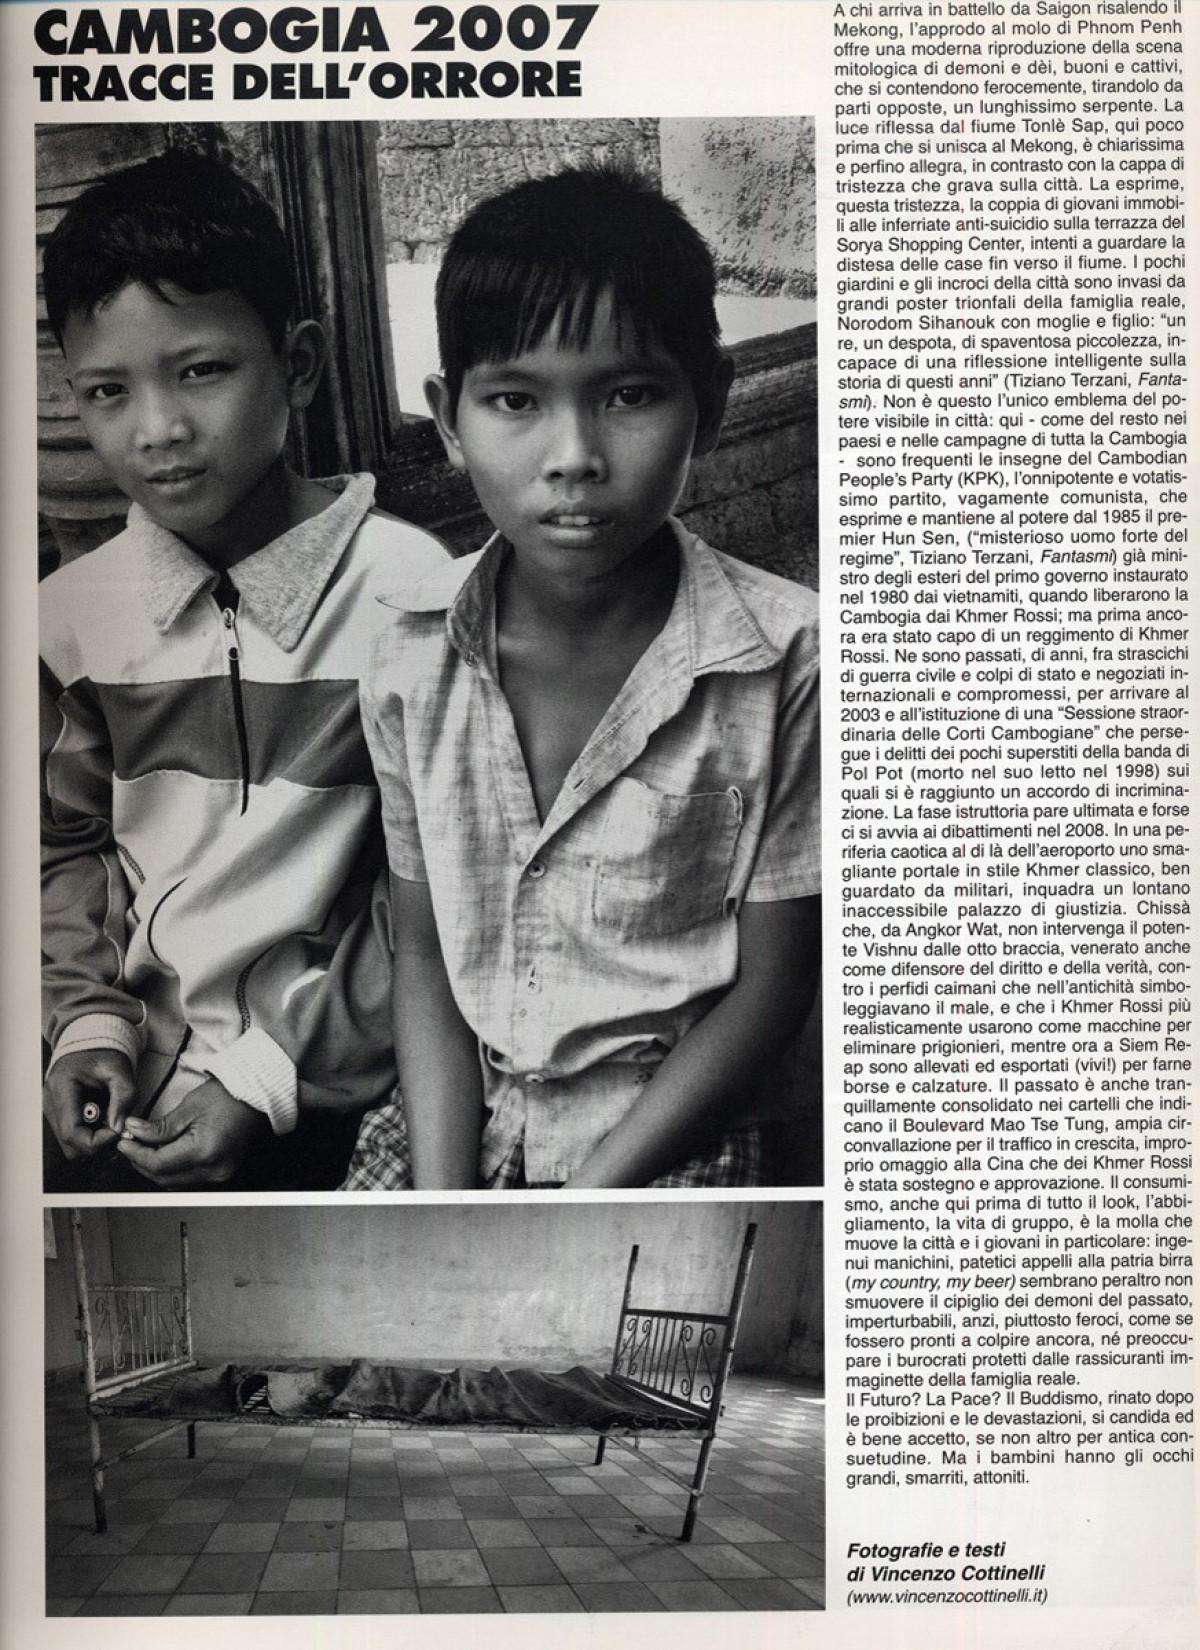 2008 - Cambodia - Una città